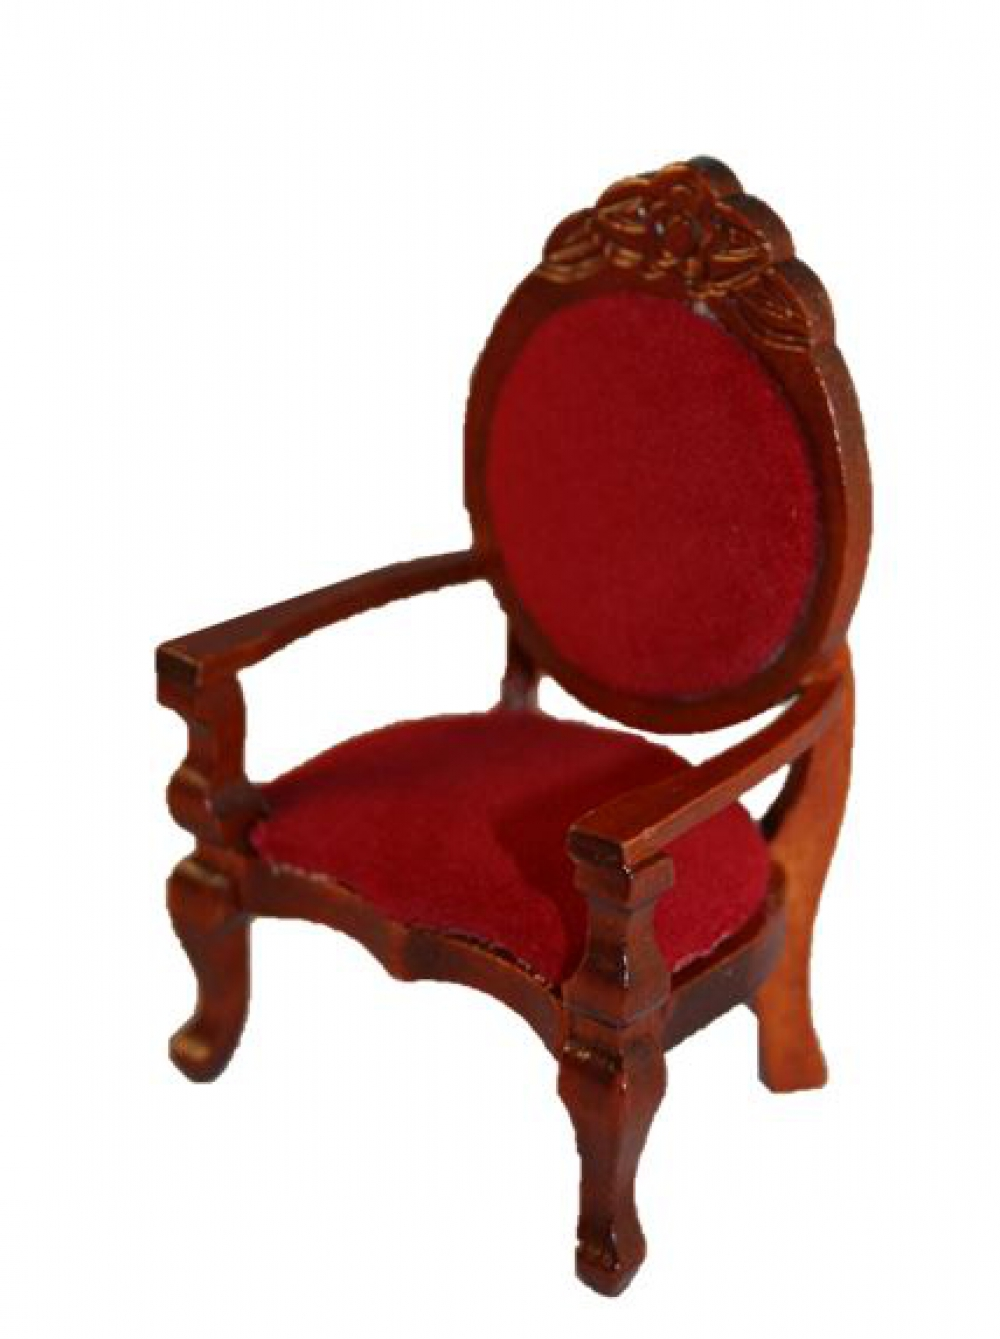 puppenstube miniatur stuhl 8cm mit rotem samt polster mahagoni ebay. Black Bedroom Furniture Sets. Home Design Ideas